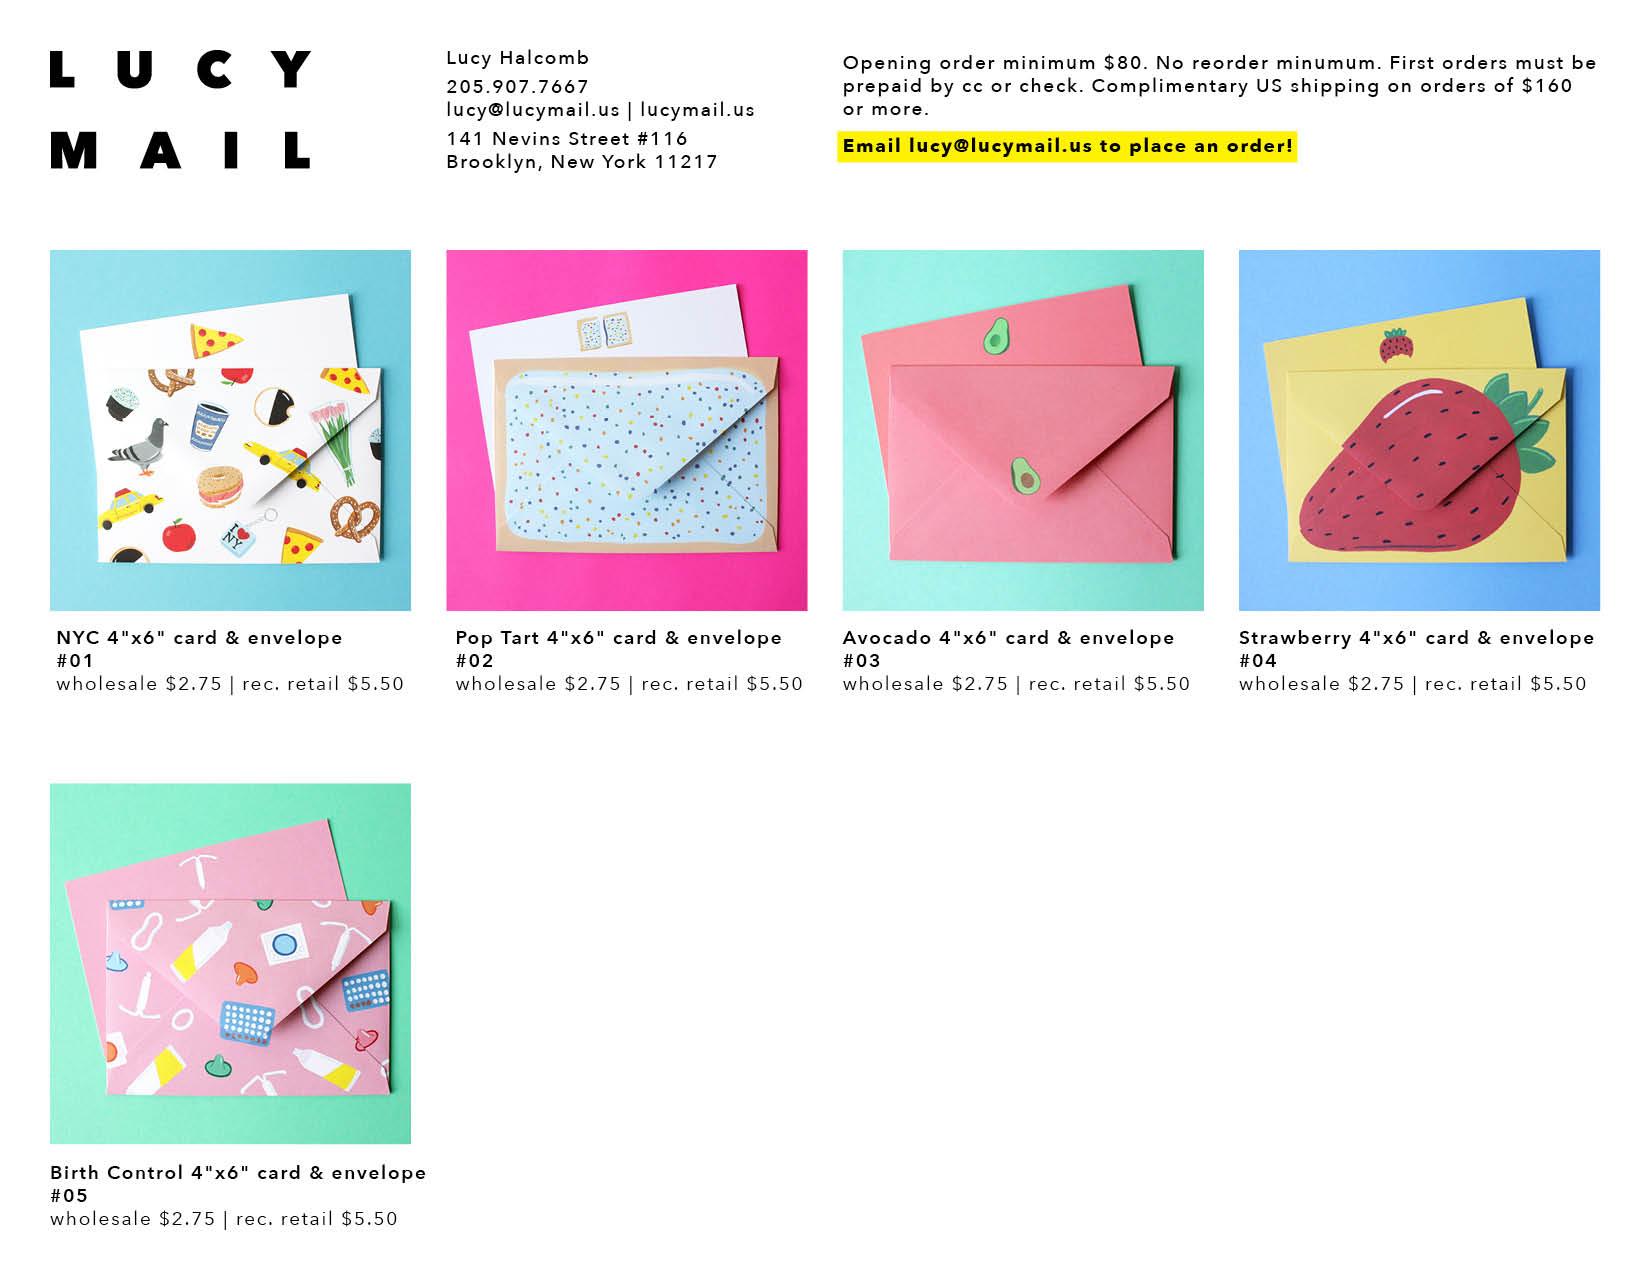 lucy_mail_line_sheet_10_17_012.jpg